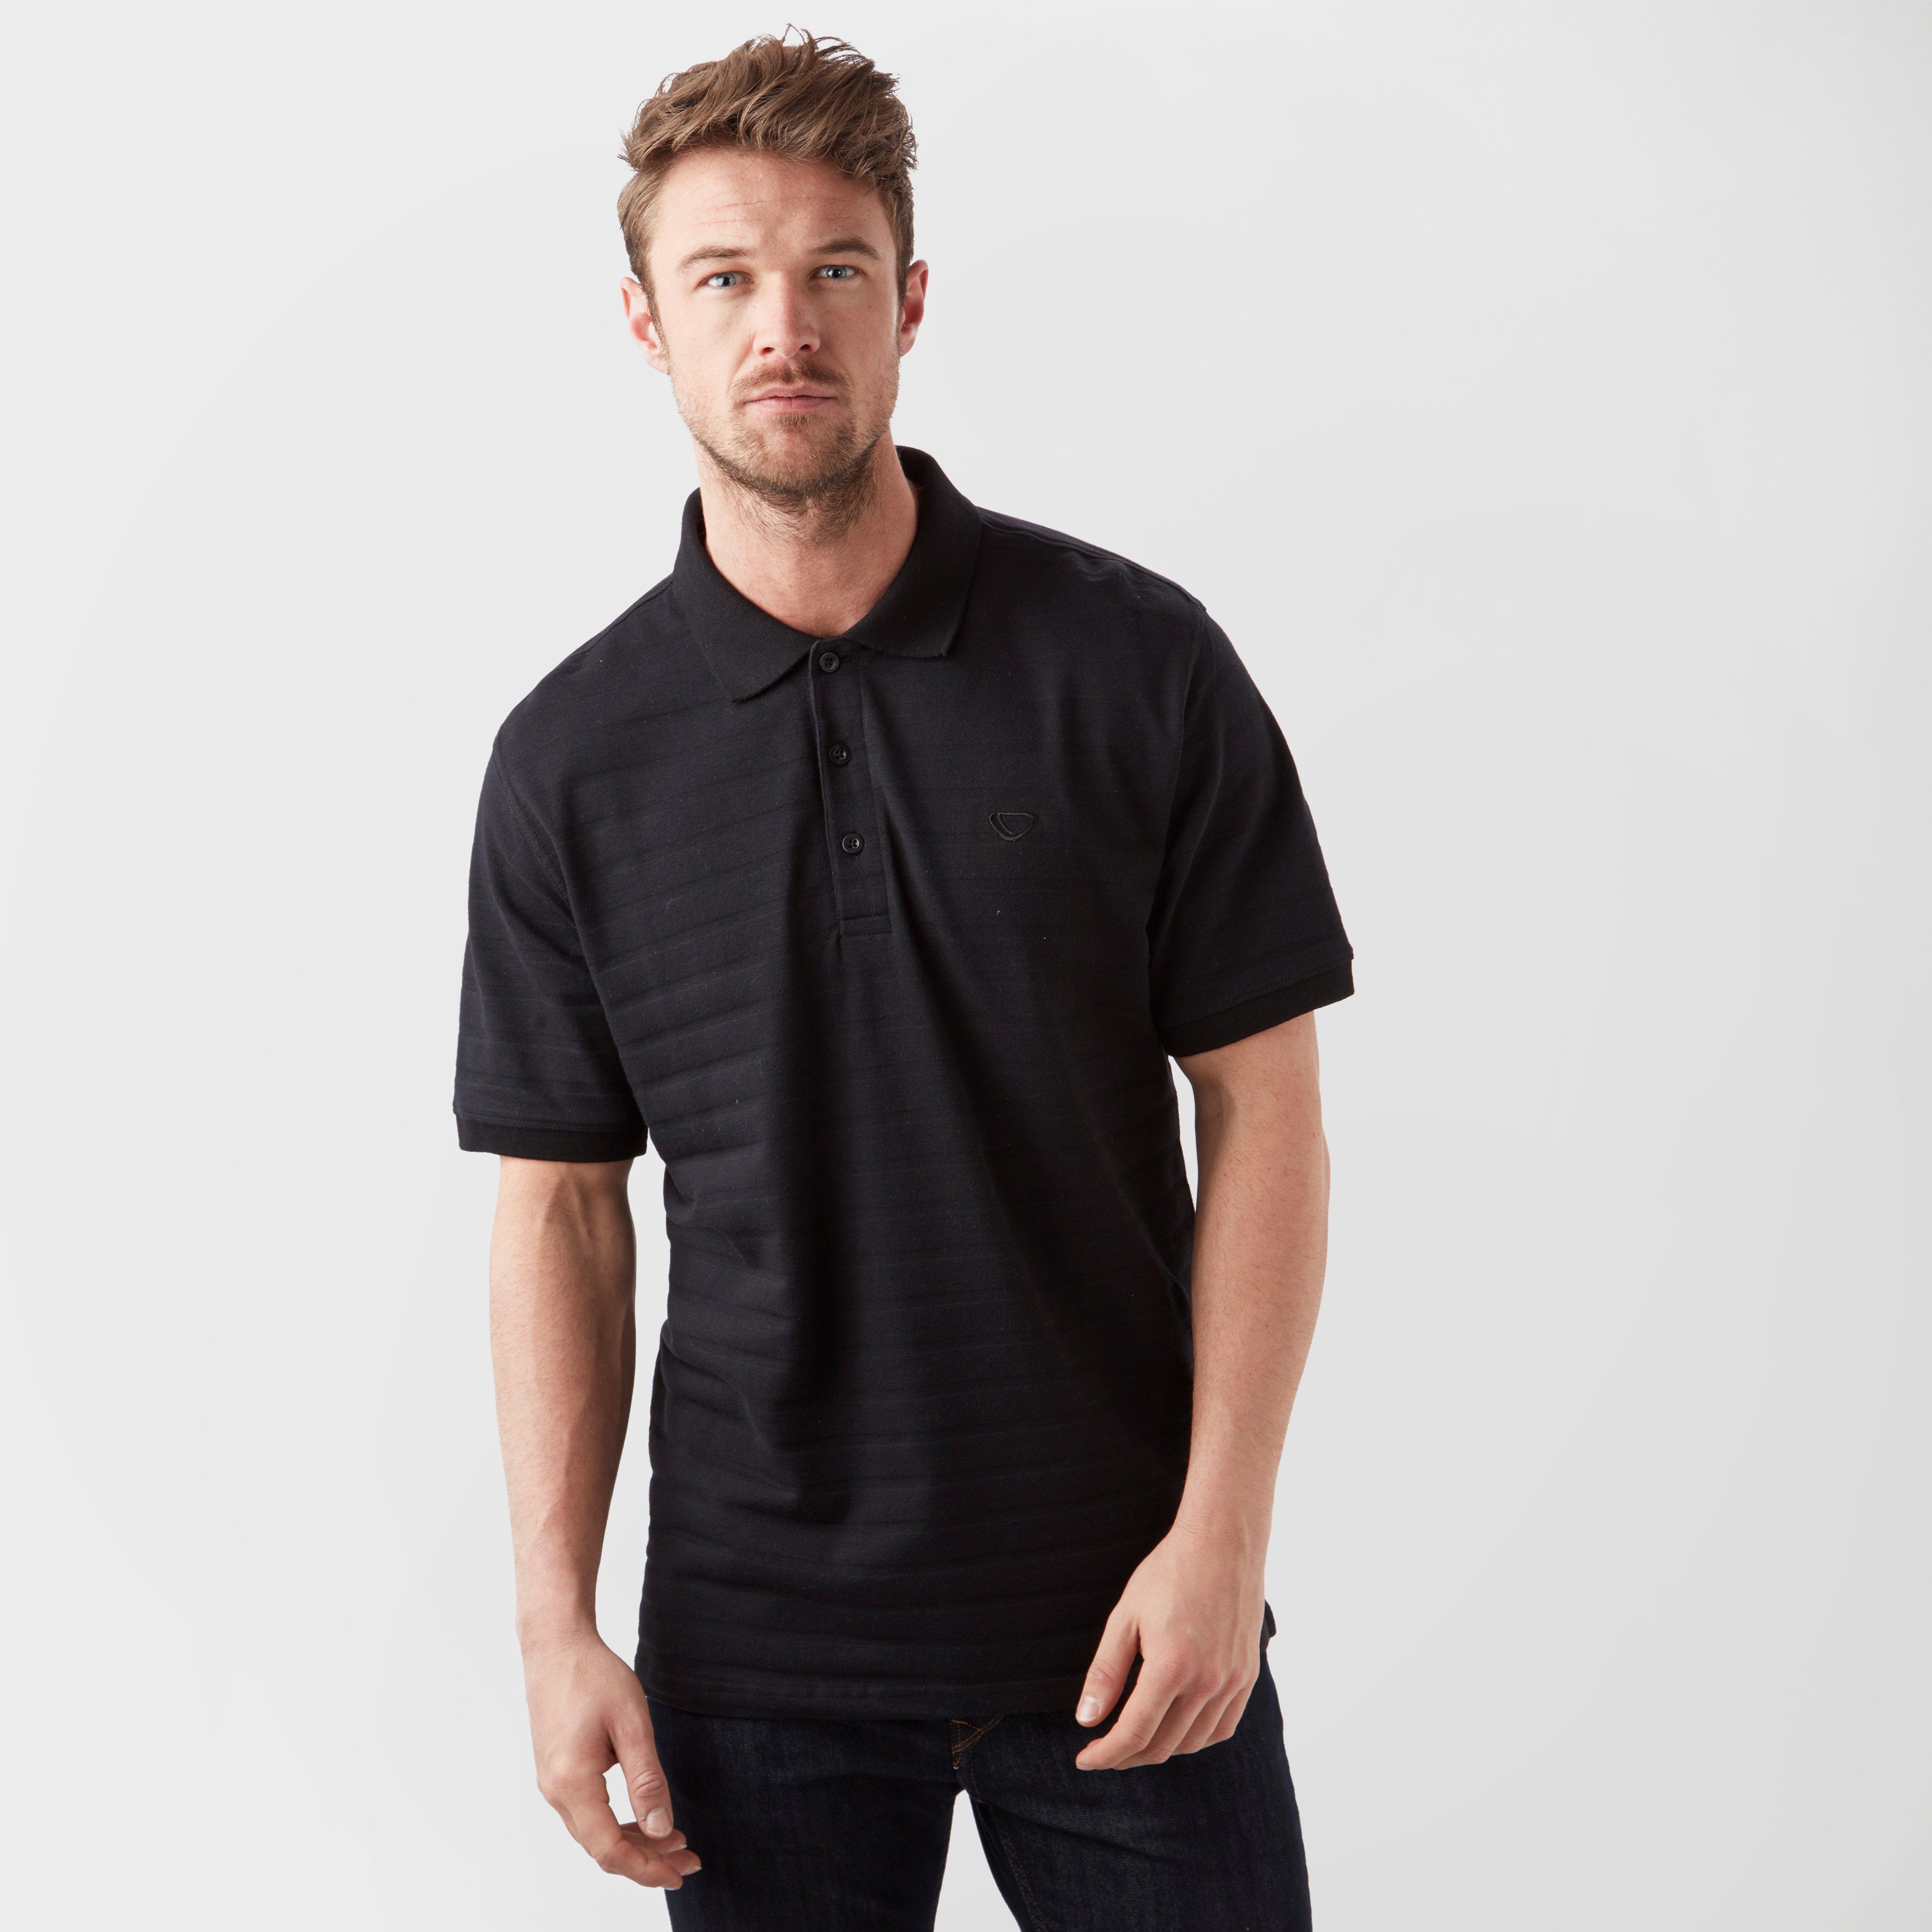 Bontrager Mens Rhythm Cycle Shorts - Black  Black